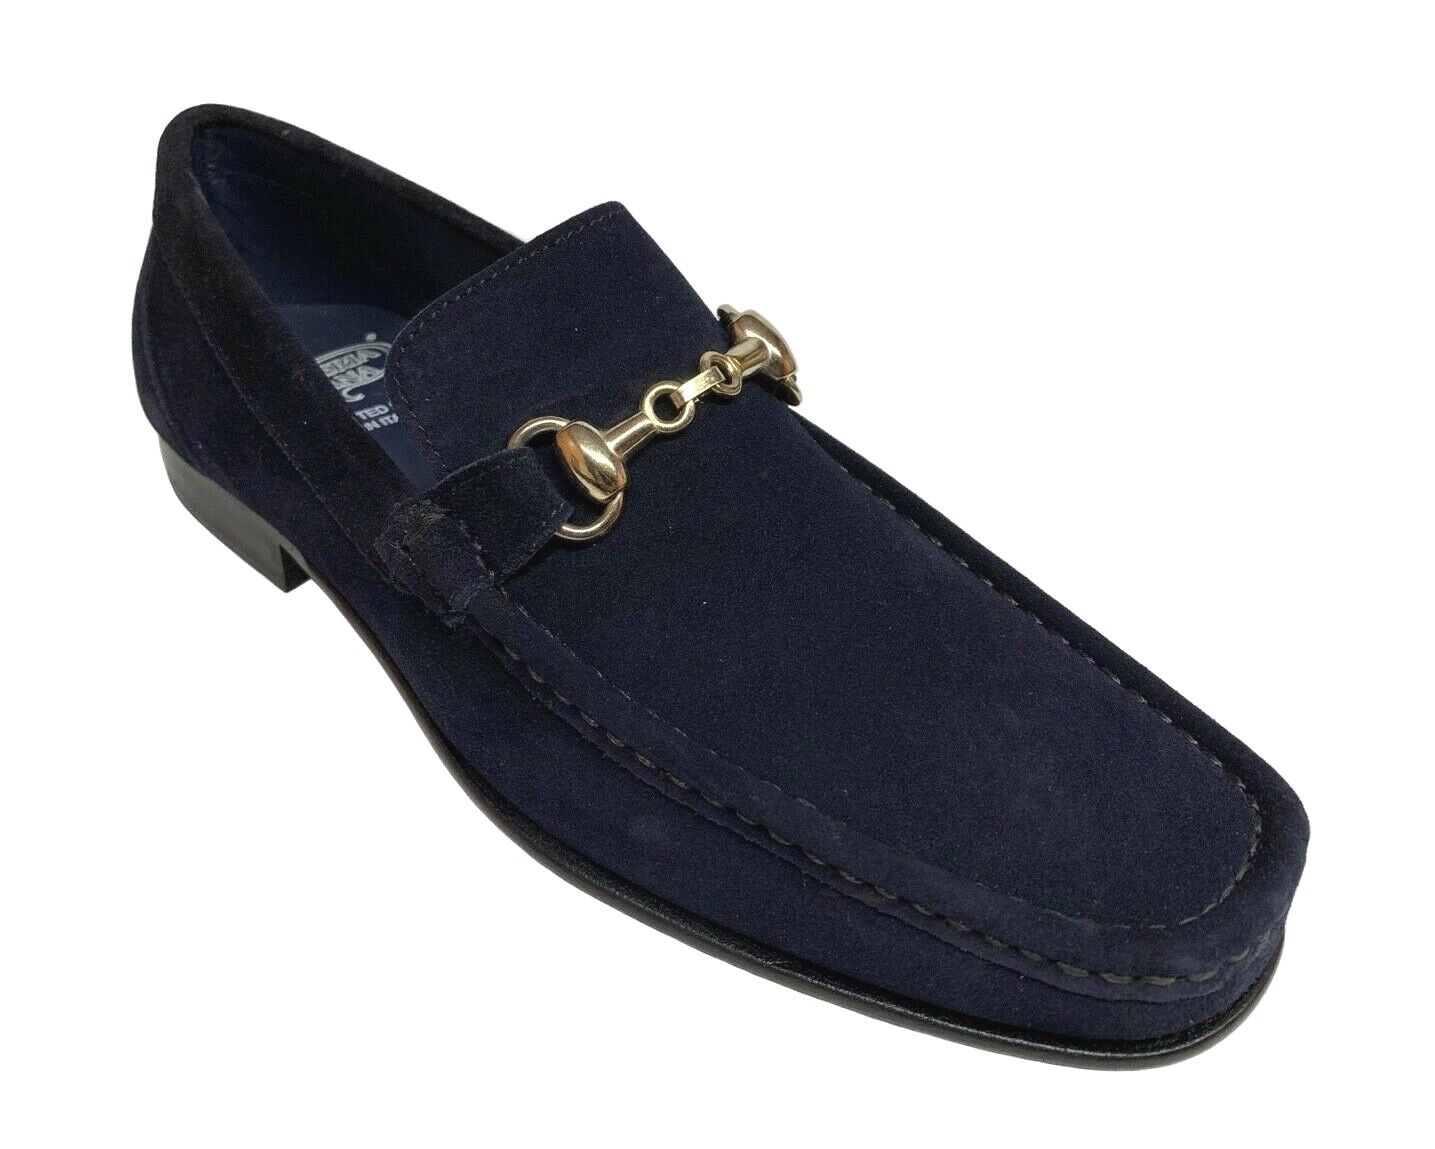 vendite online Calzoleria Toscana Uomo Uomo Uomo Slip On blu Suede Hand Craft Loafer scarpe 8616  vendita di offerte